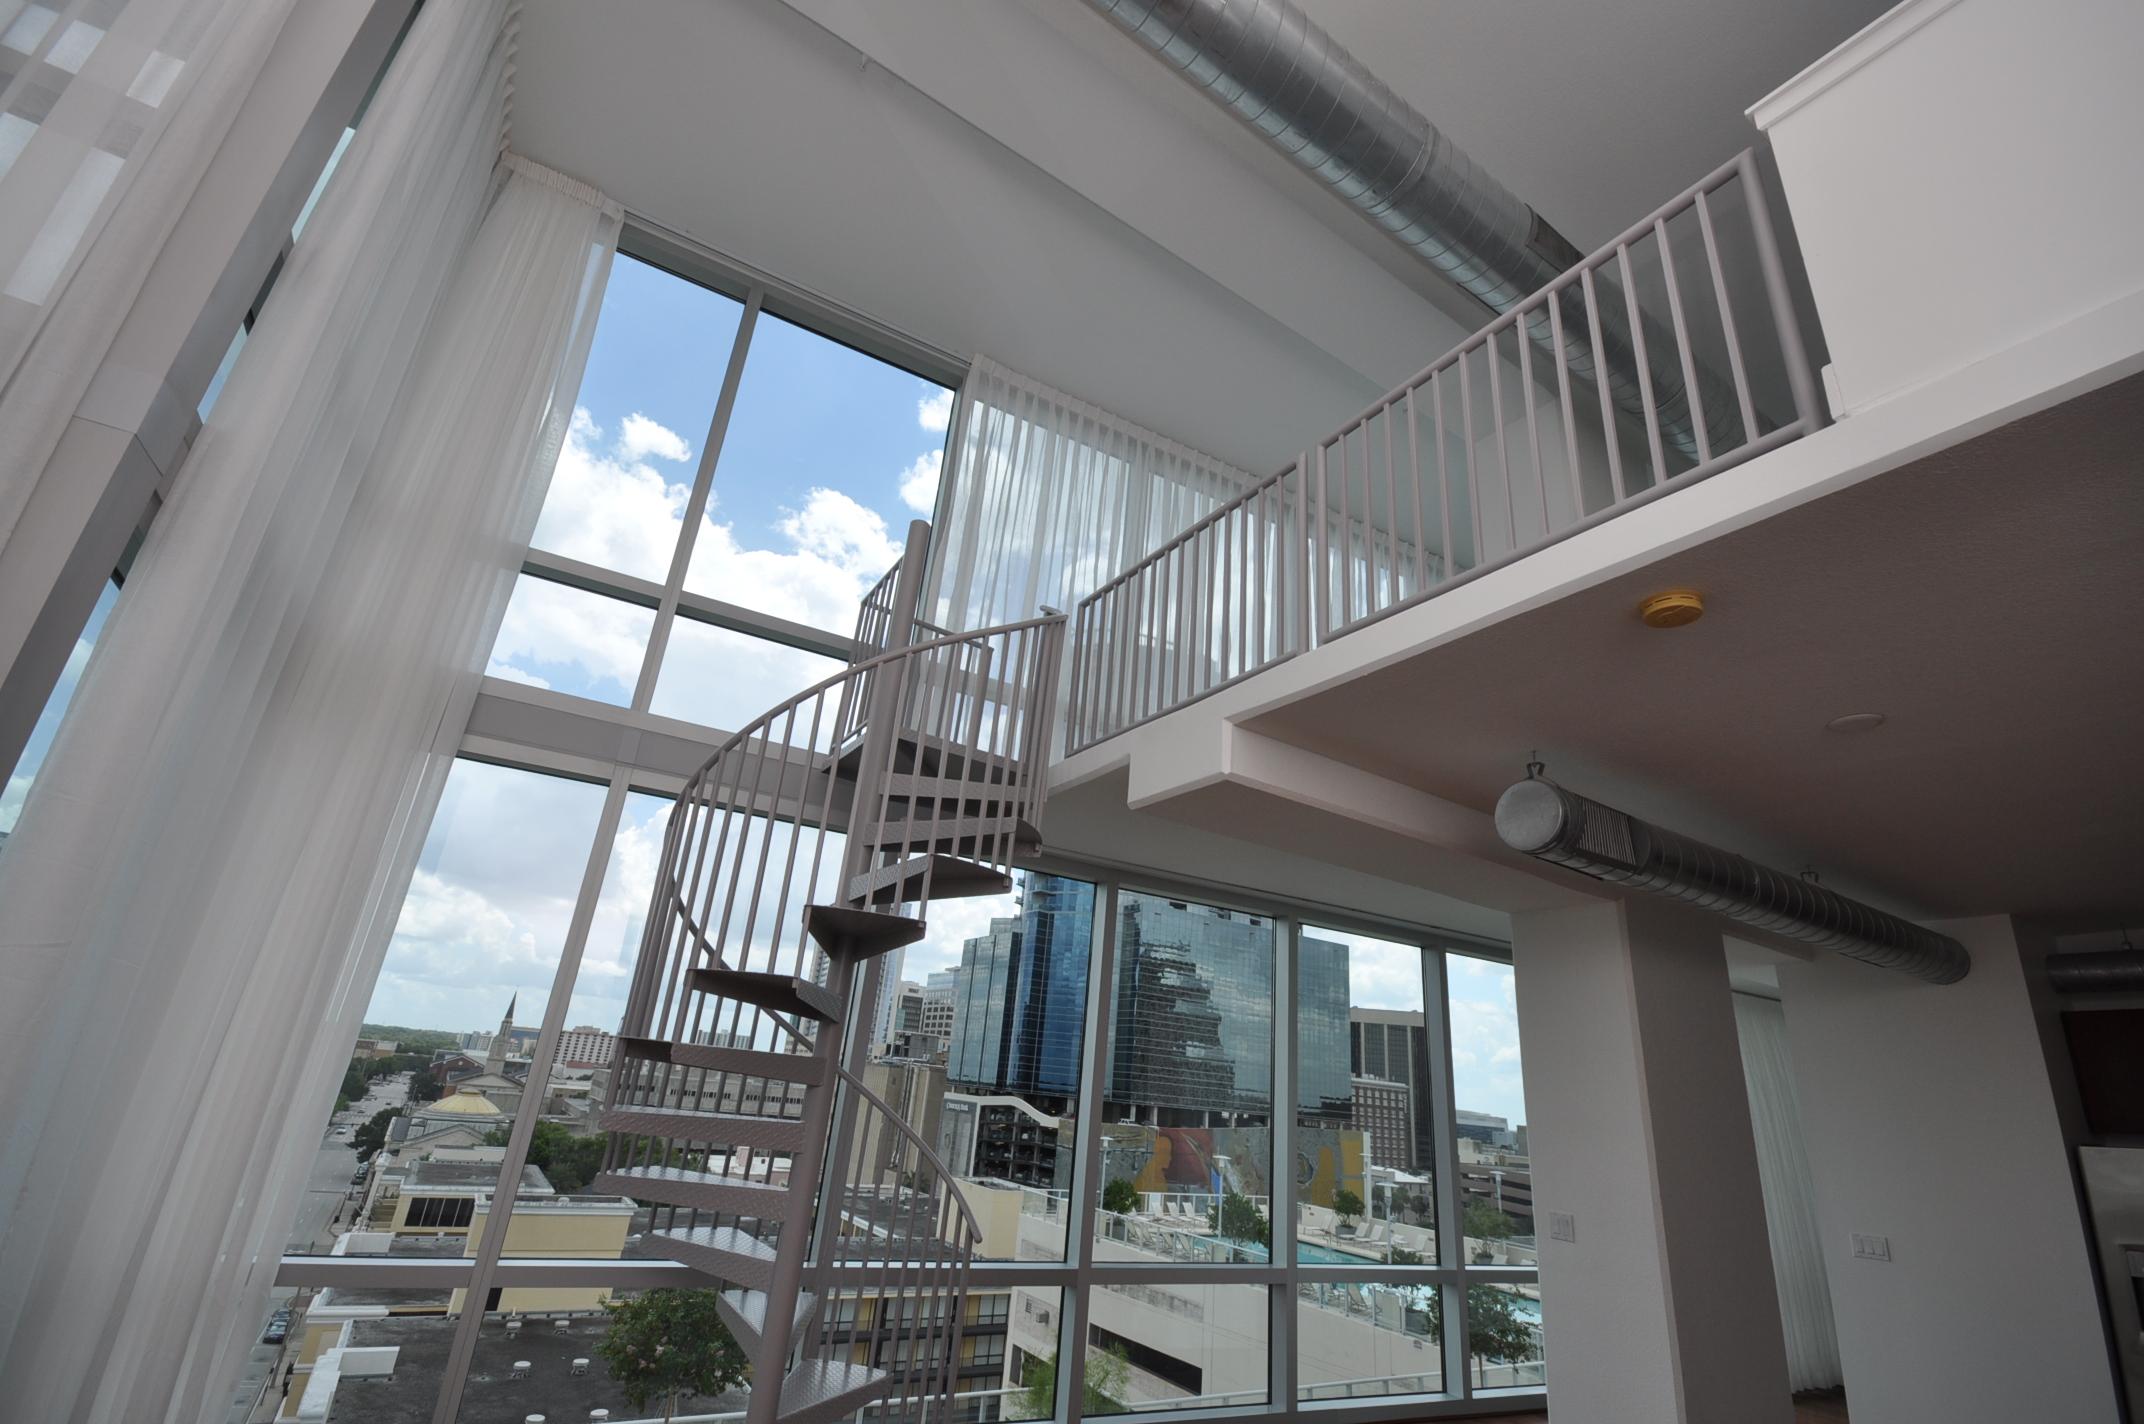 Property Management Company Orlando Fl Condos The Vue At Lake Eola